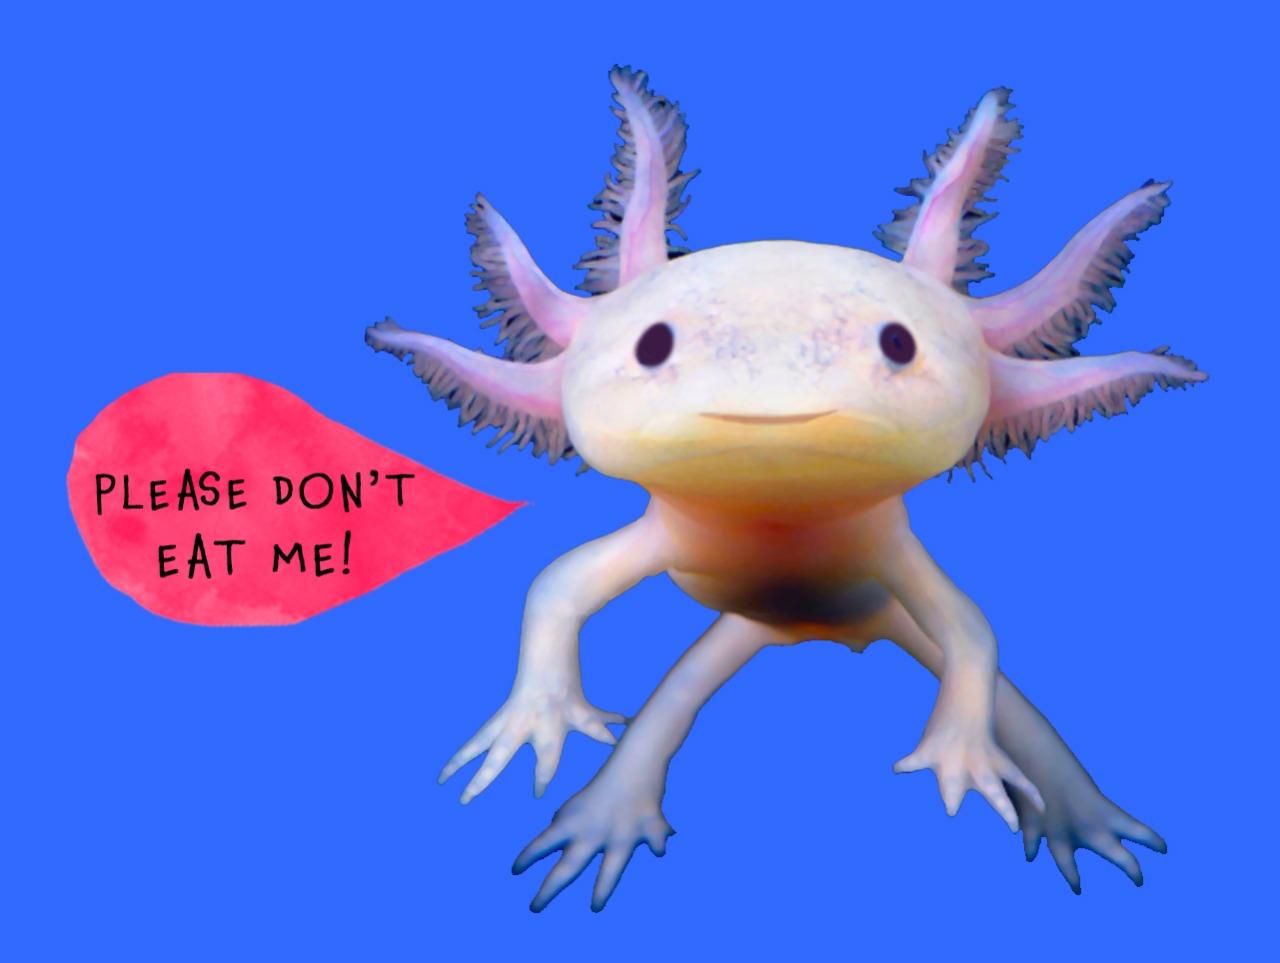 worldwide_buddies_axolotl_no_eating.jpeg